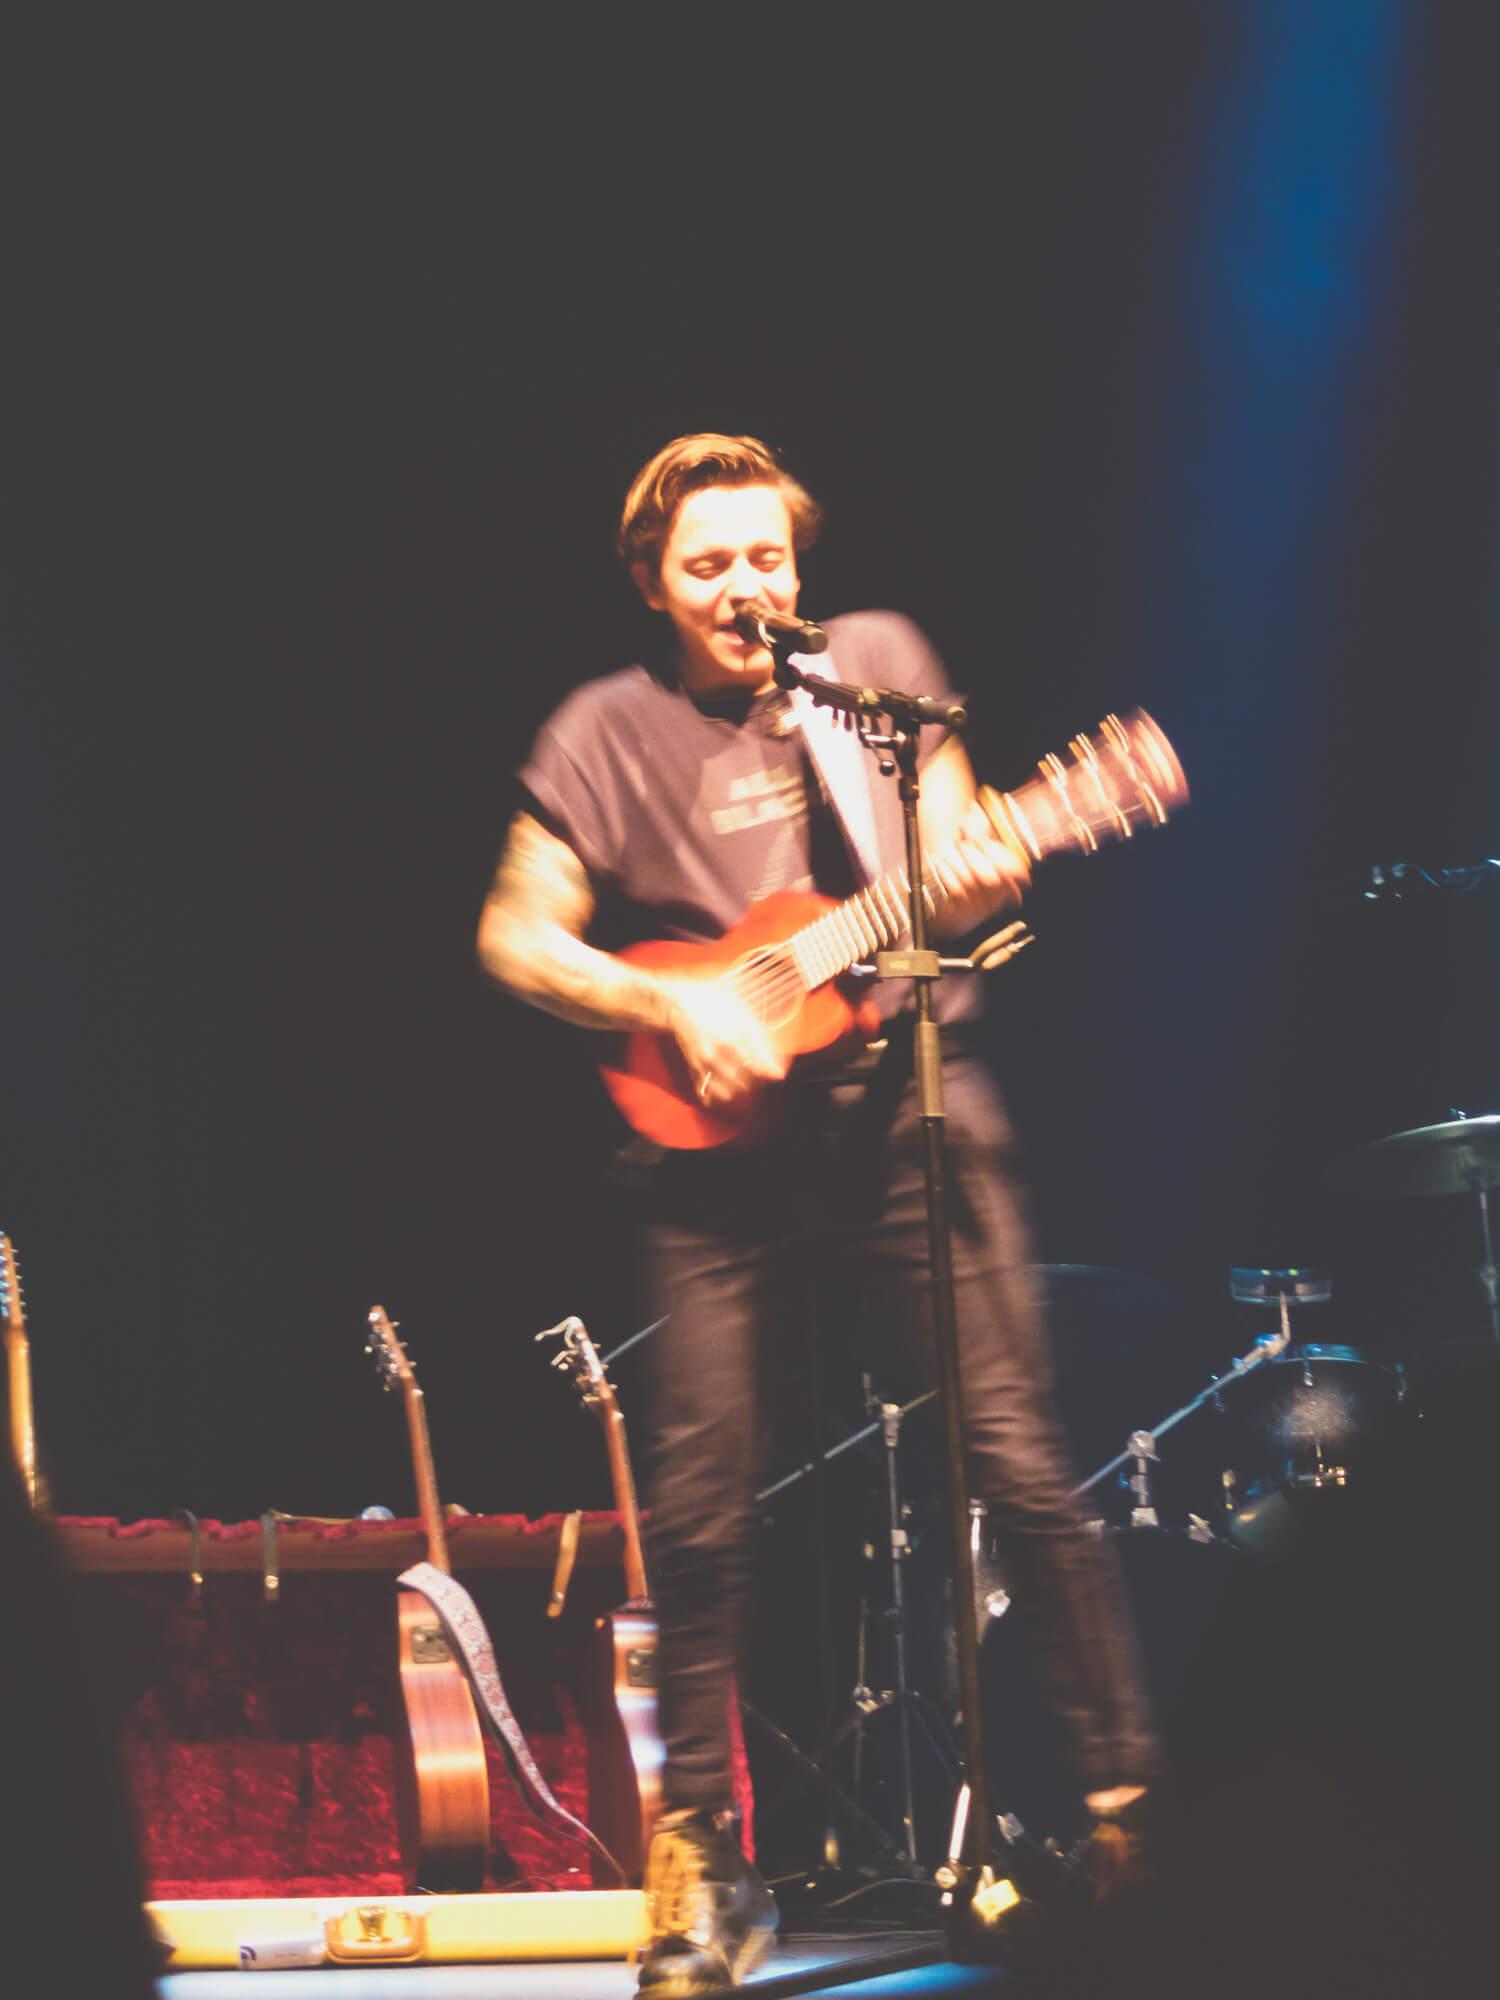 scott helman premiere partie concert europe